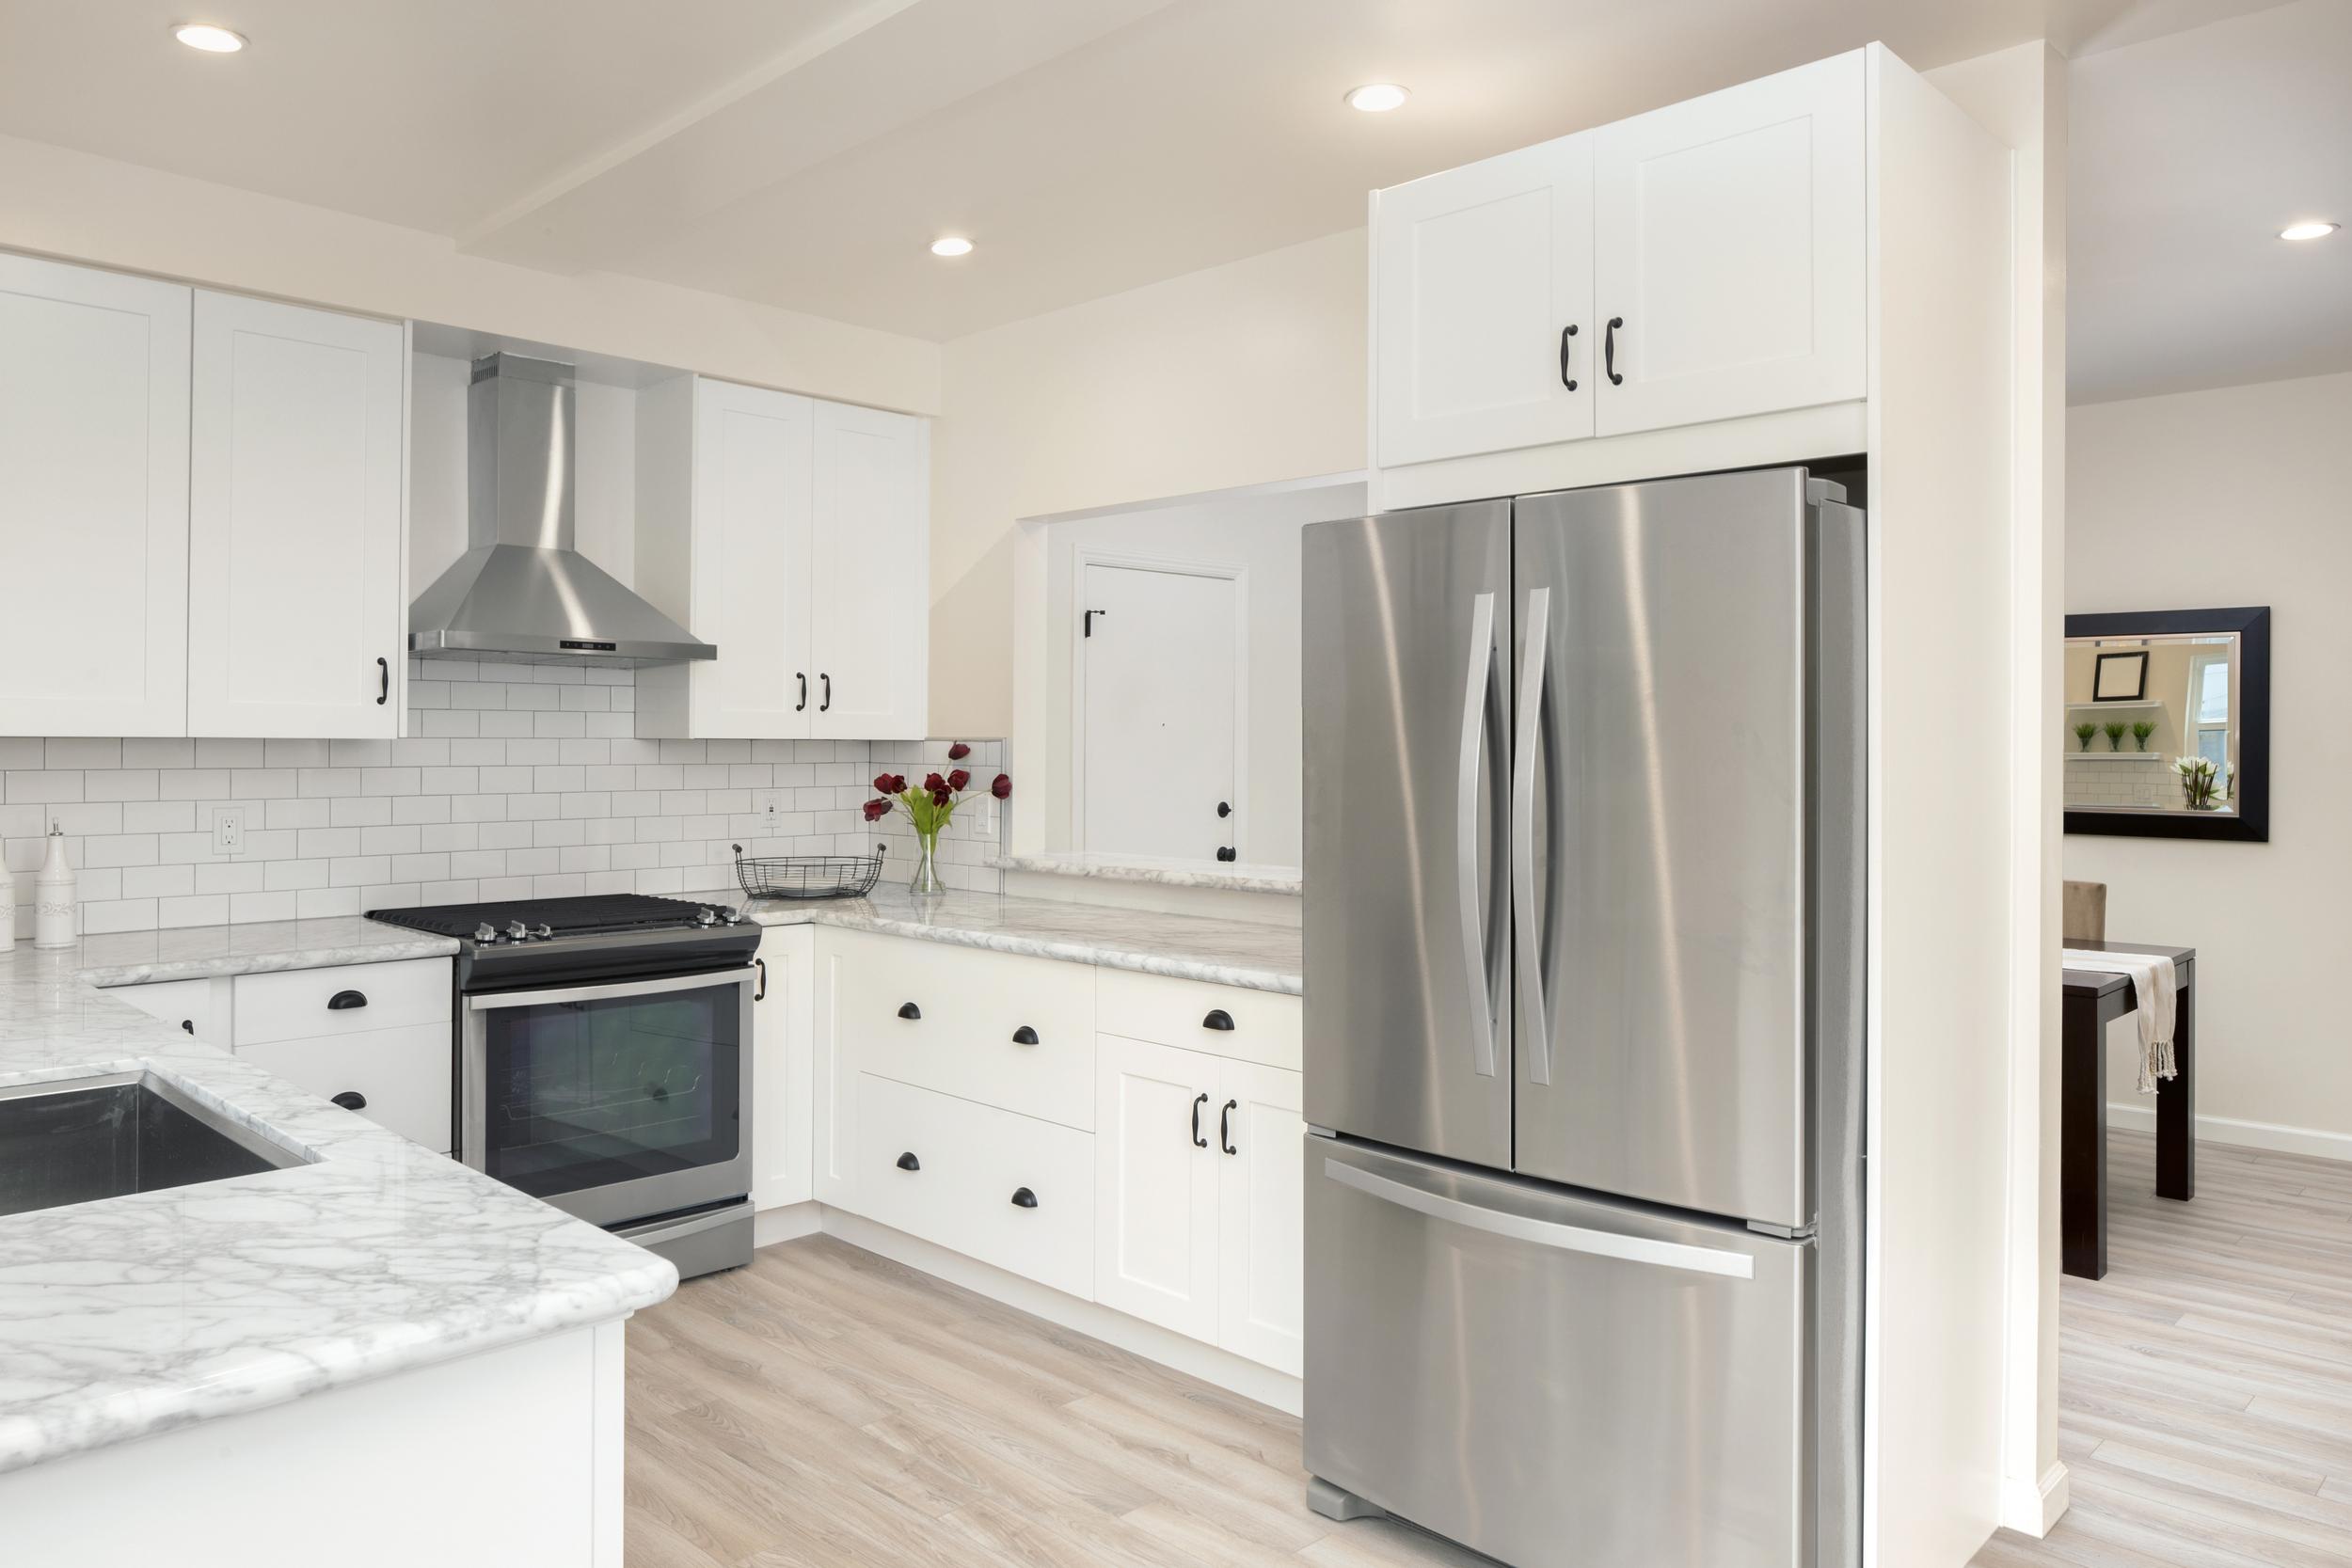 White Carrara Marble Kitchen Counter Top